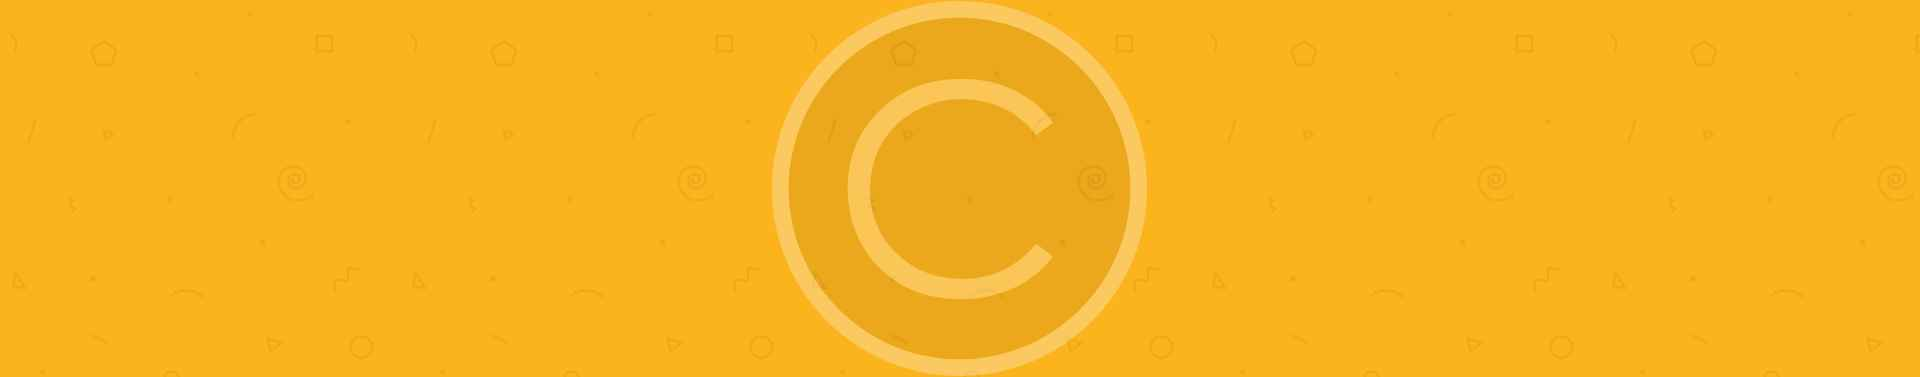 Rectangle-16-copy-2.jpg